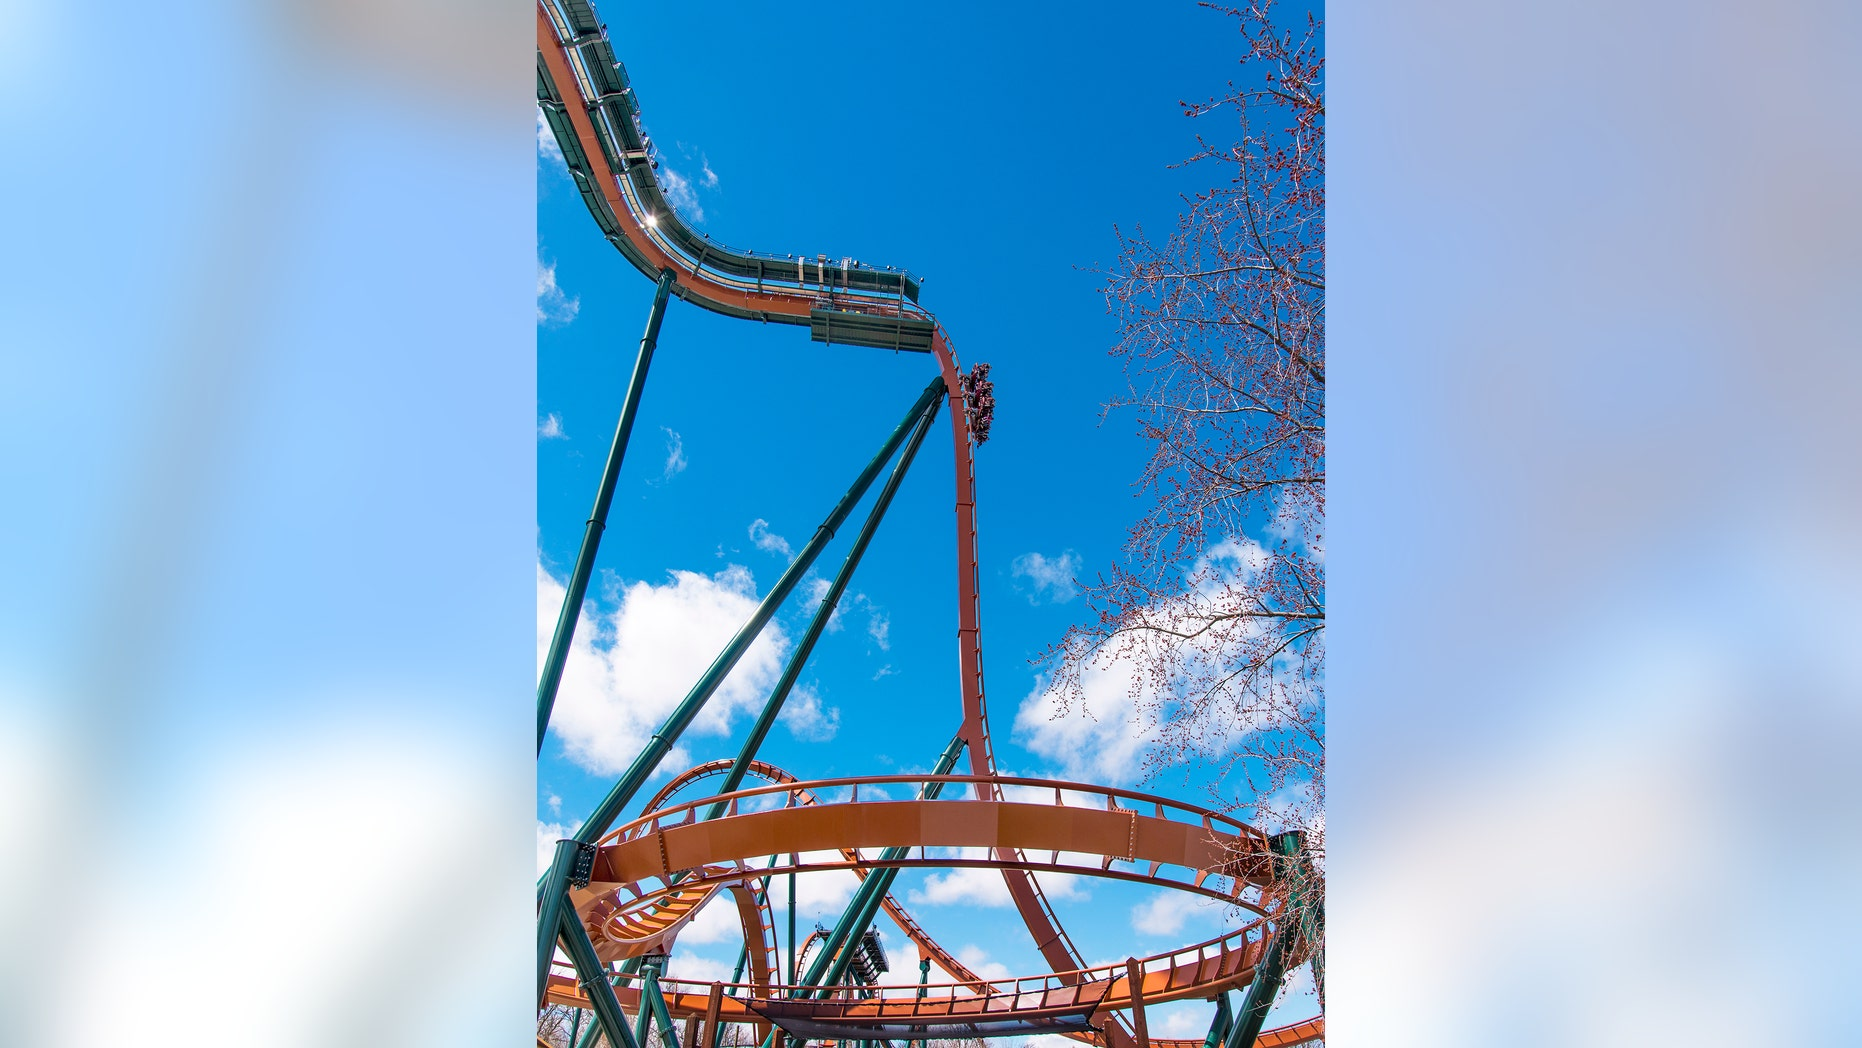 This week, Canada's Wonderland theme park, located in Vaughan, Ontario, will unveil its Yukon Striker ride.